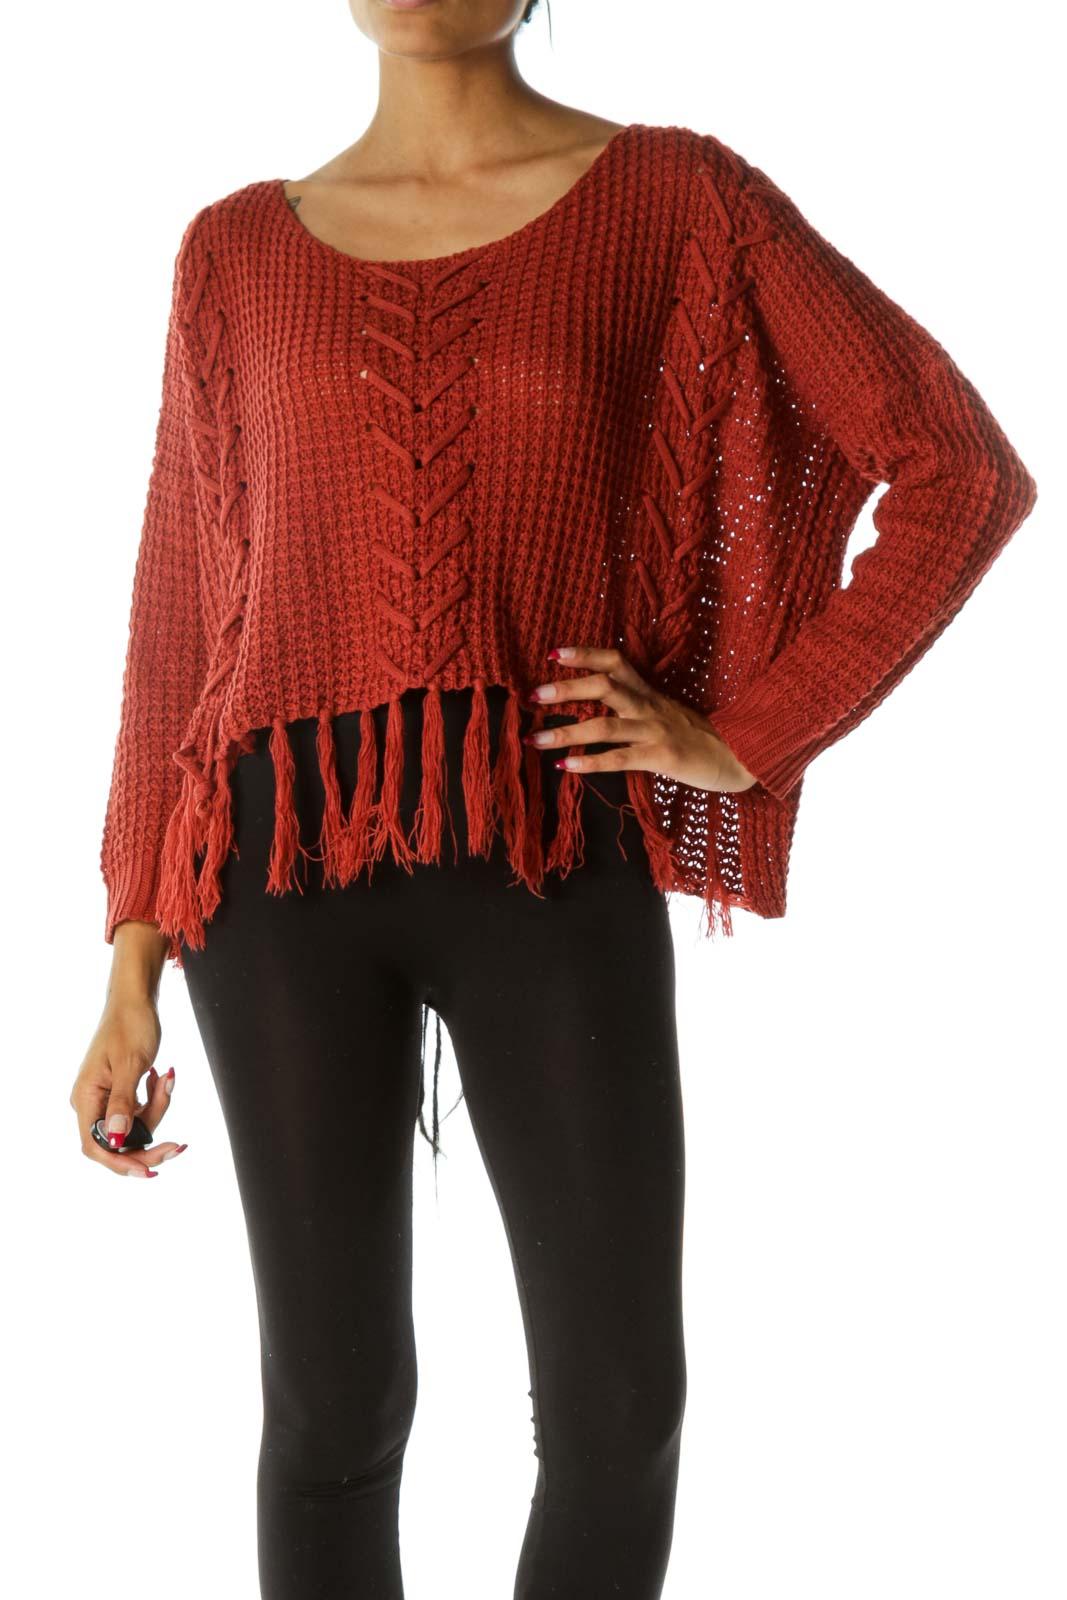 Burnt Orange Long Sleeve Round Neck Knit Top